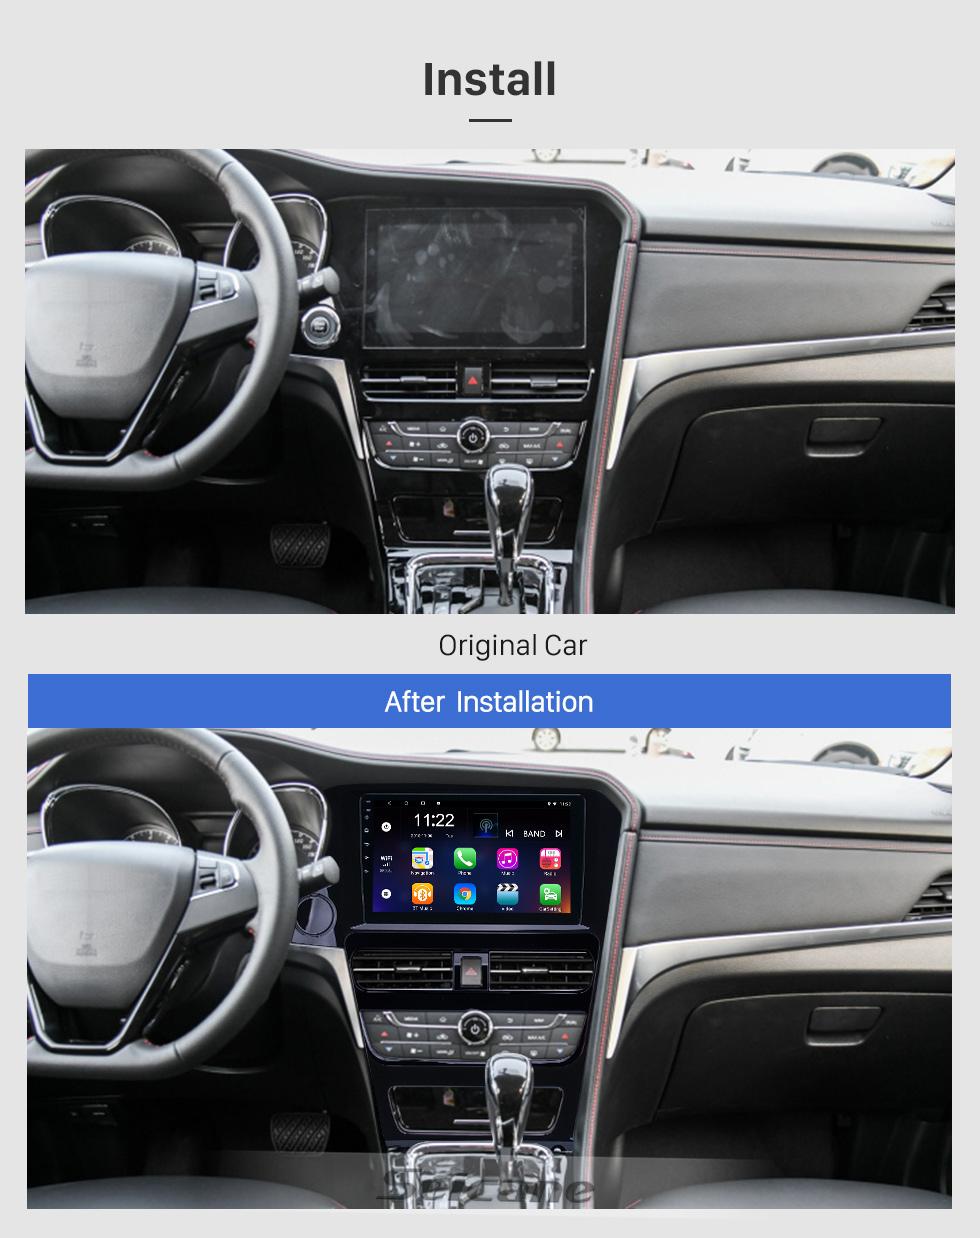 Seicane 10,1 Zoll GPS Navigationsradio Android 8.1 für 2018-2019 Venucia T70 High Version mit HD Touchscreen Bluetooth Unterstützung Carplay DAB +